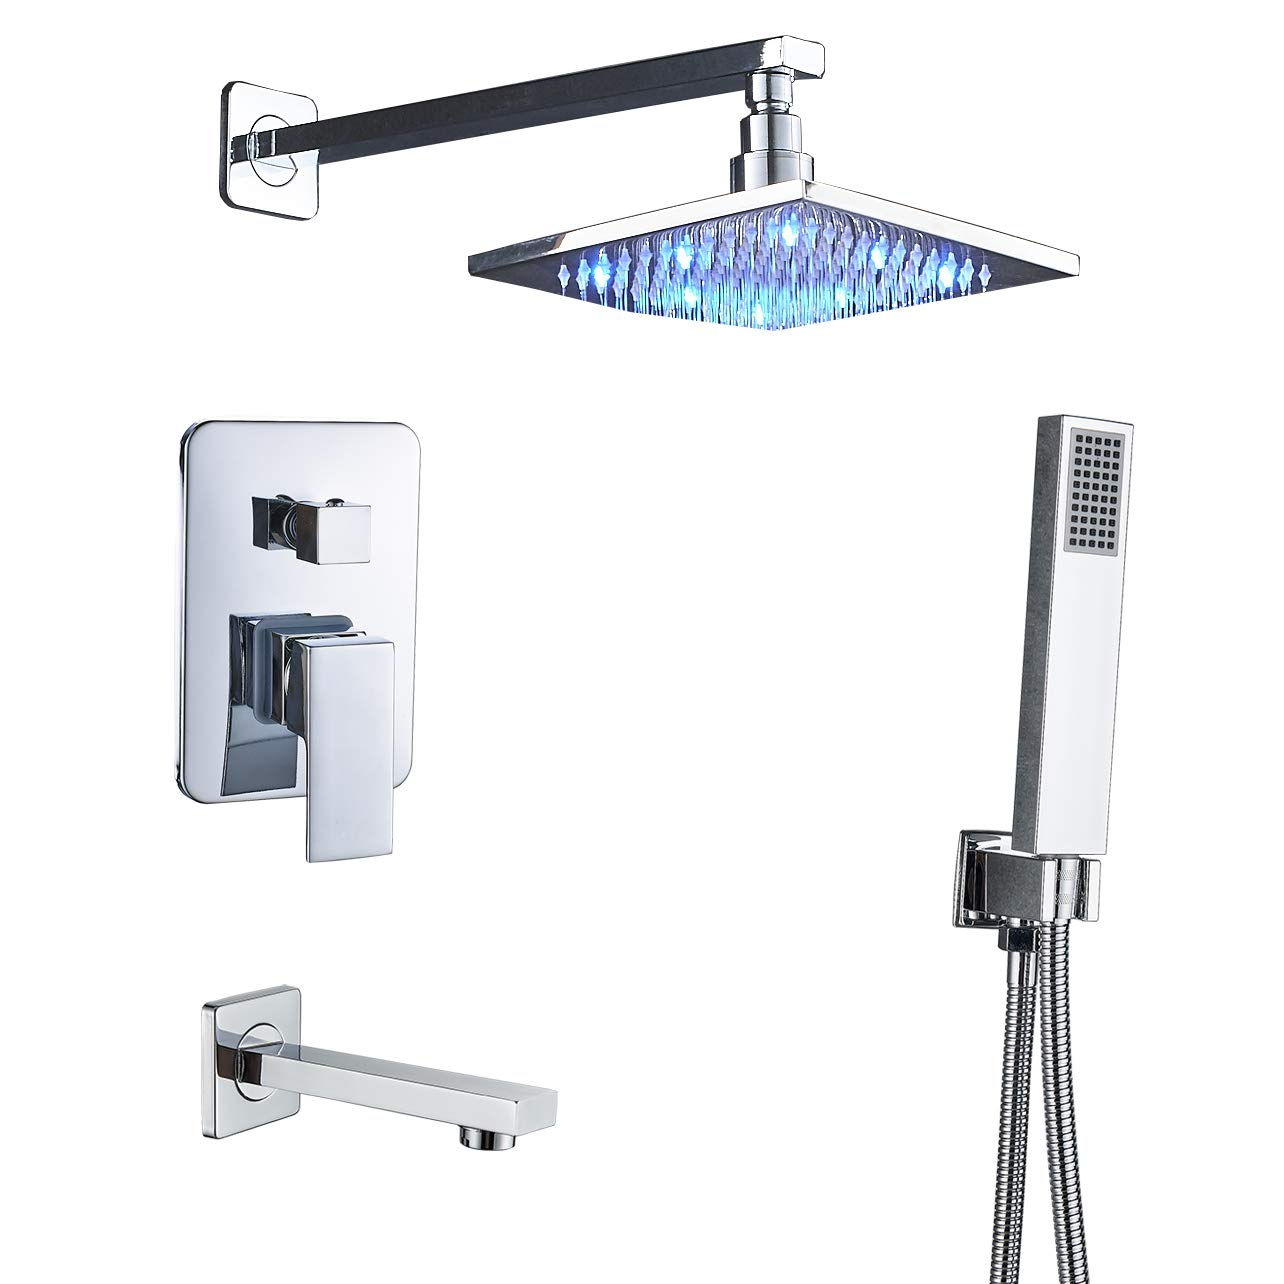 garden faucet Home & Garden Shower Faucet Combo Set 20 Inch LED ...